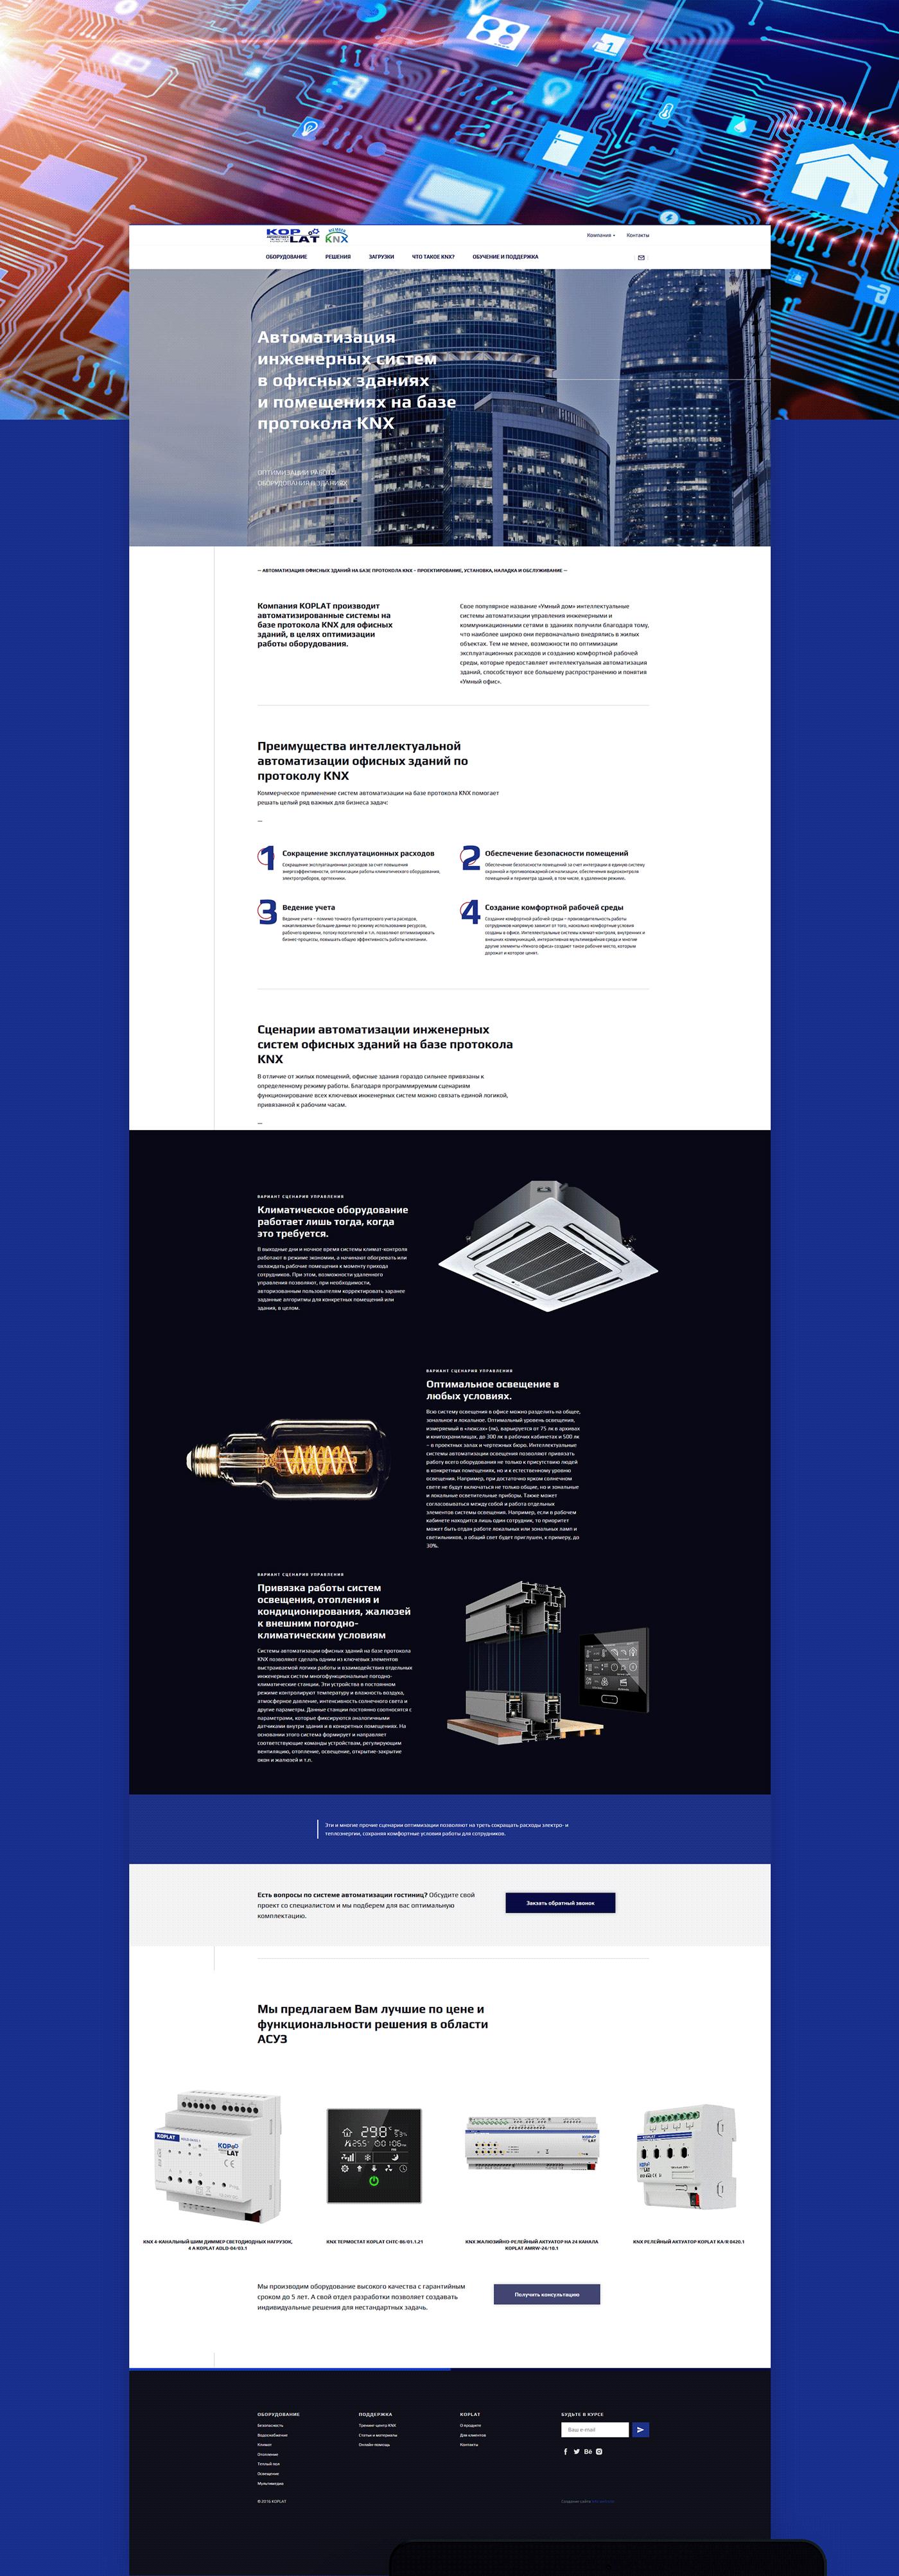 Web Webdesign KNX designsite site Website tilda